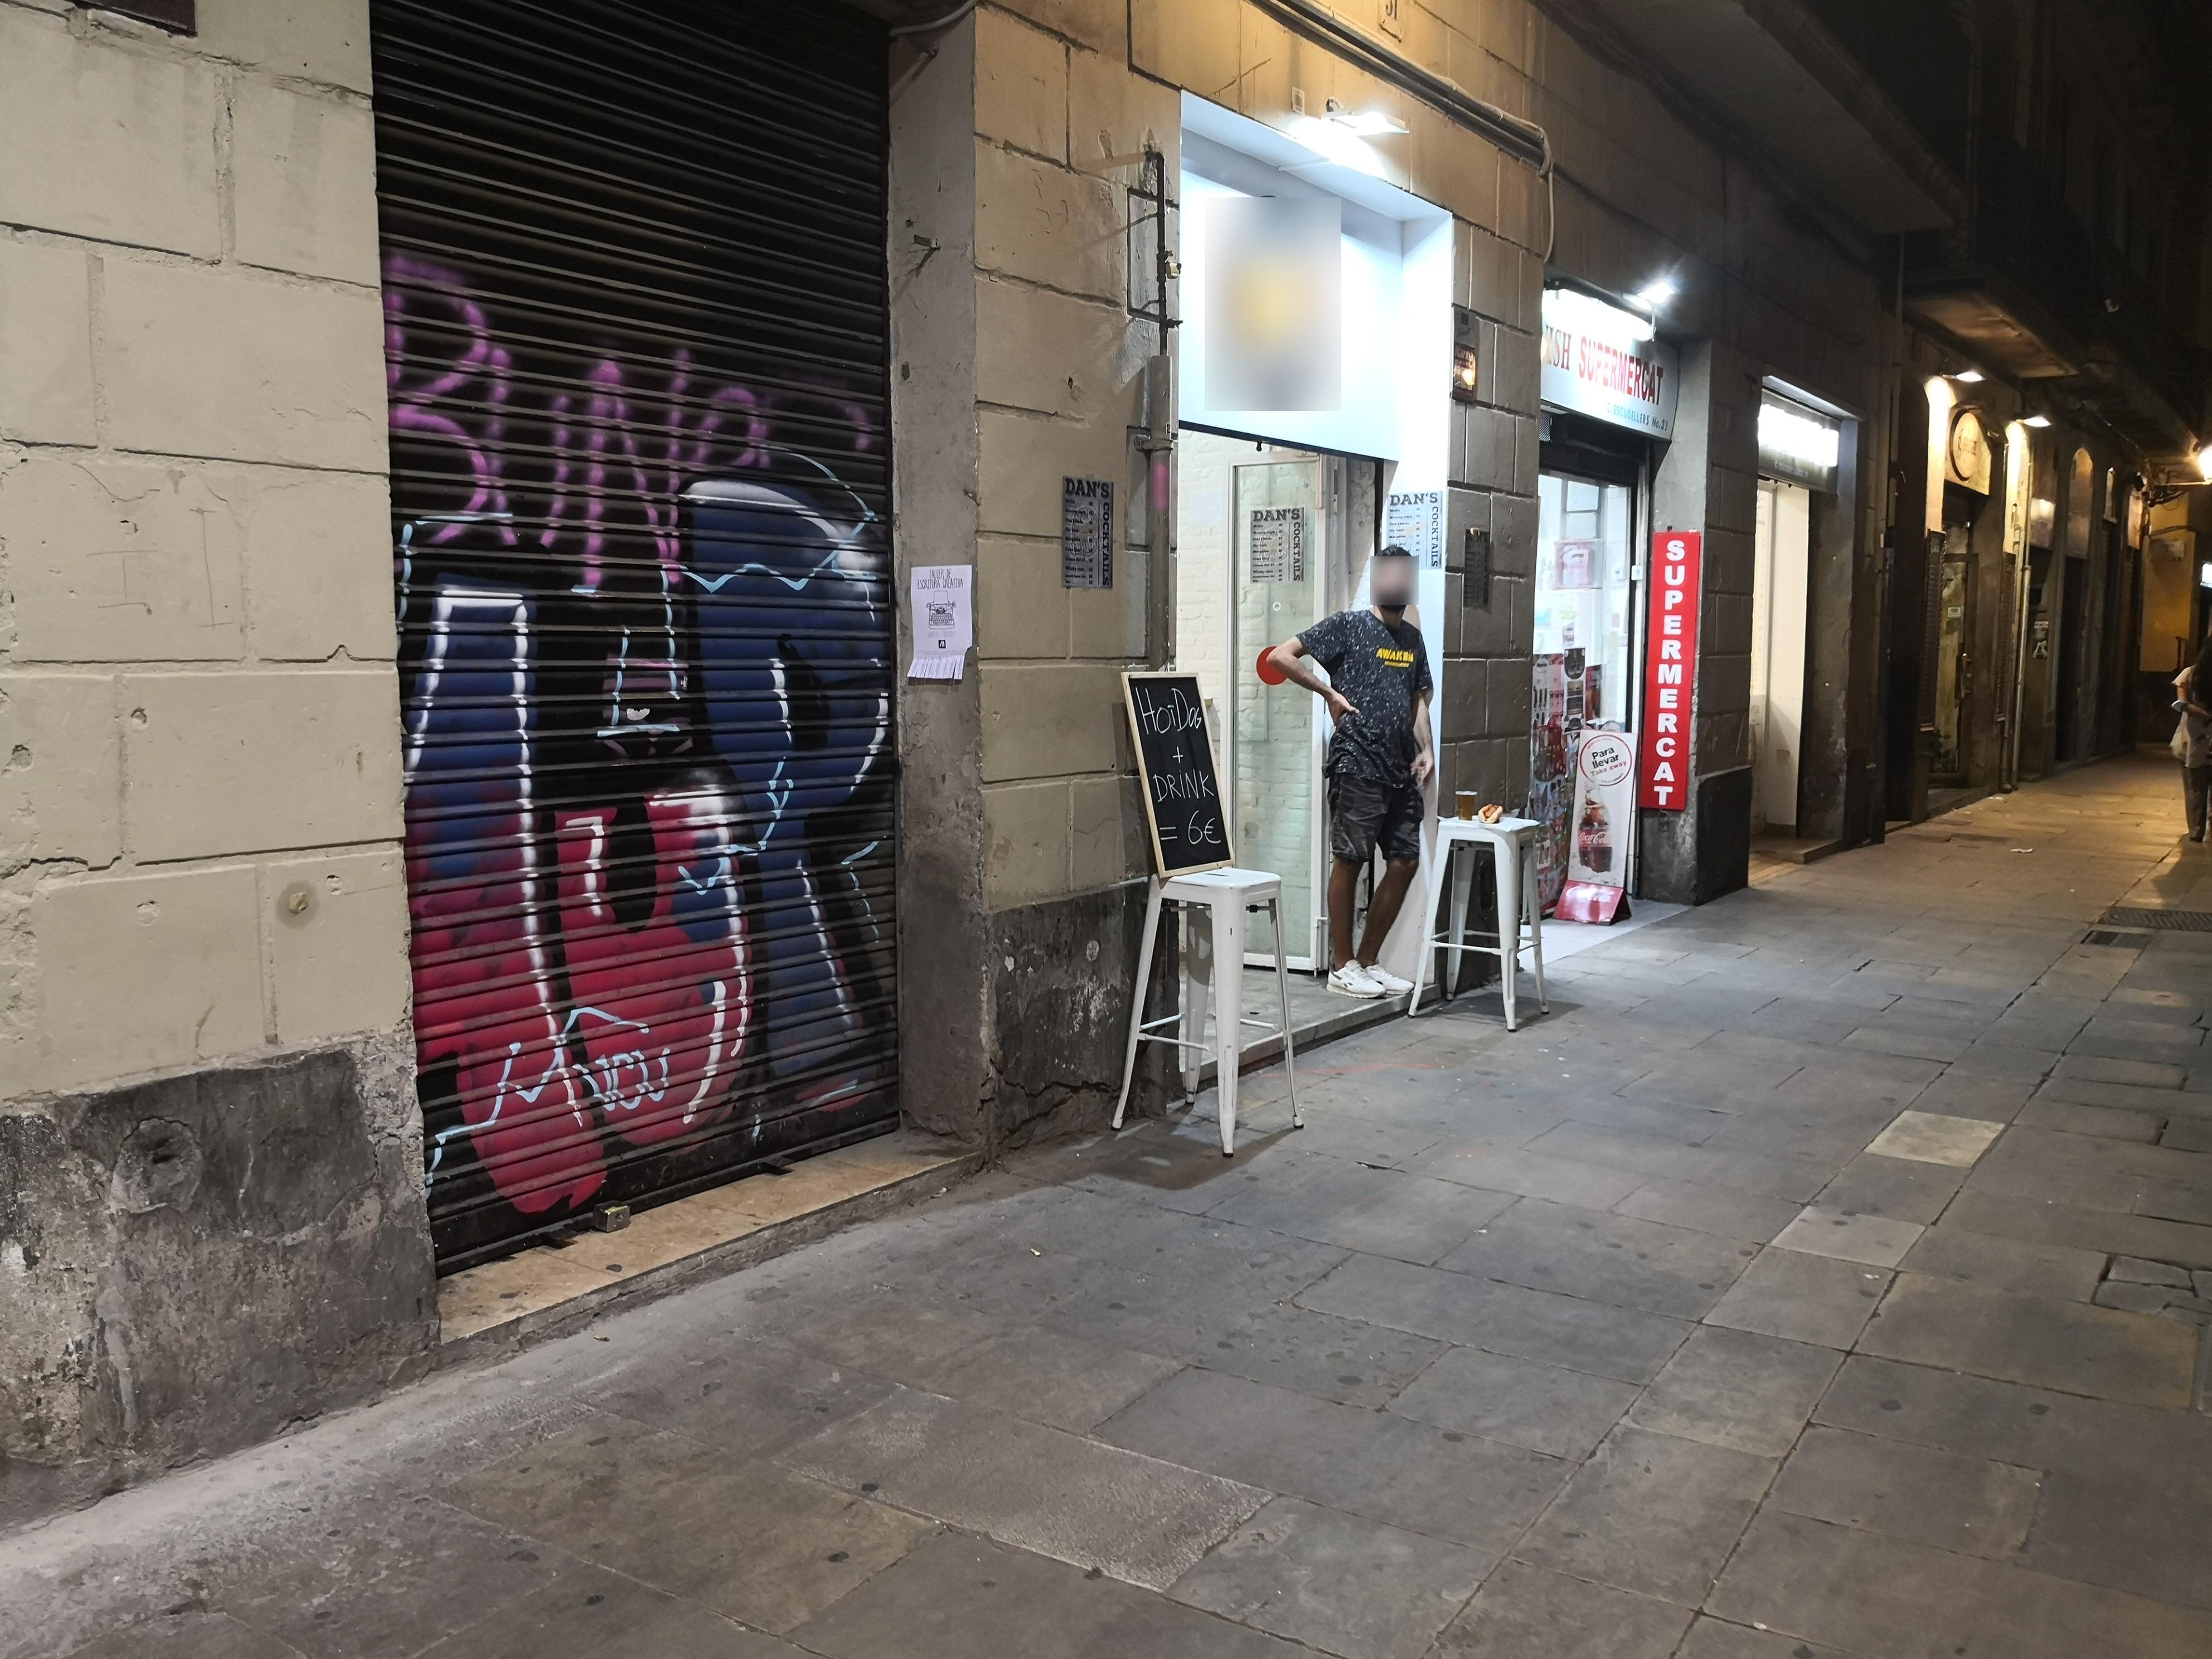 Escudellers, 33 - okupant façana il·legalment!!!